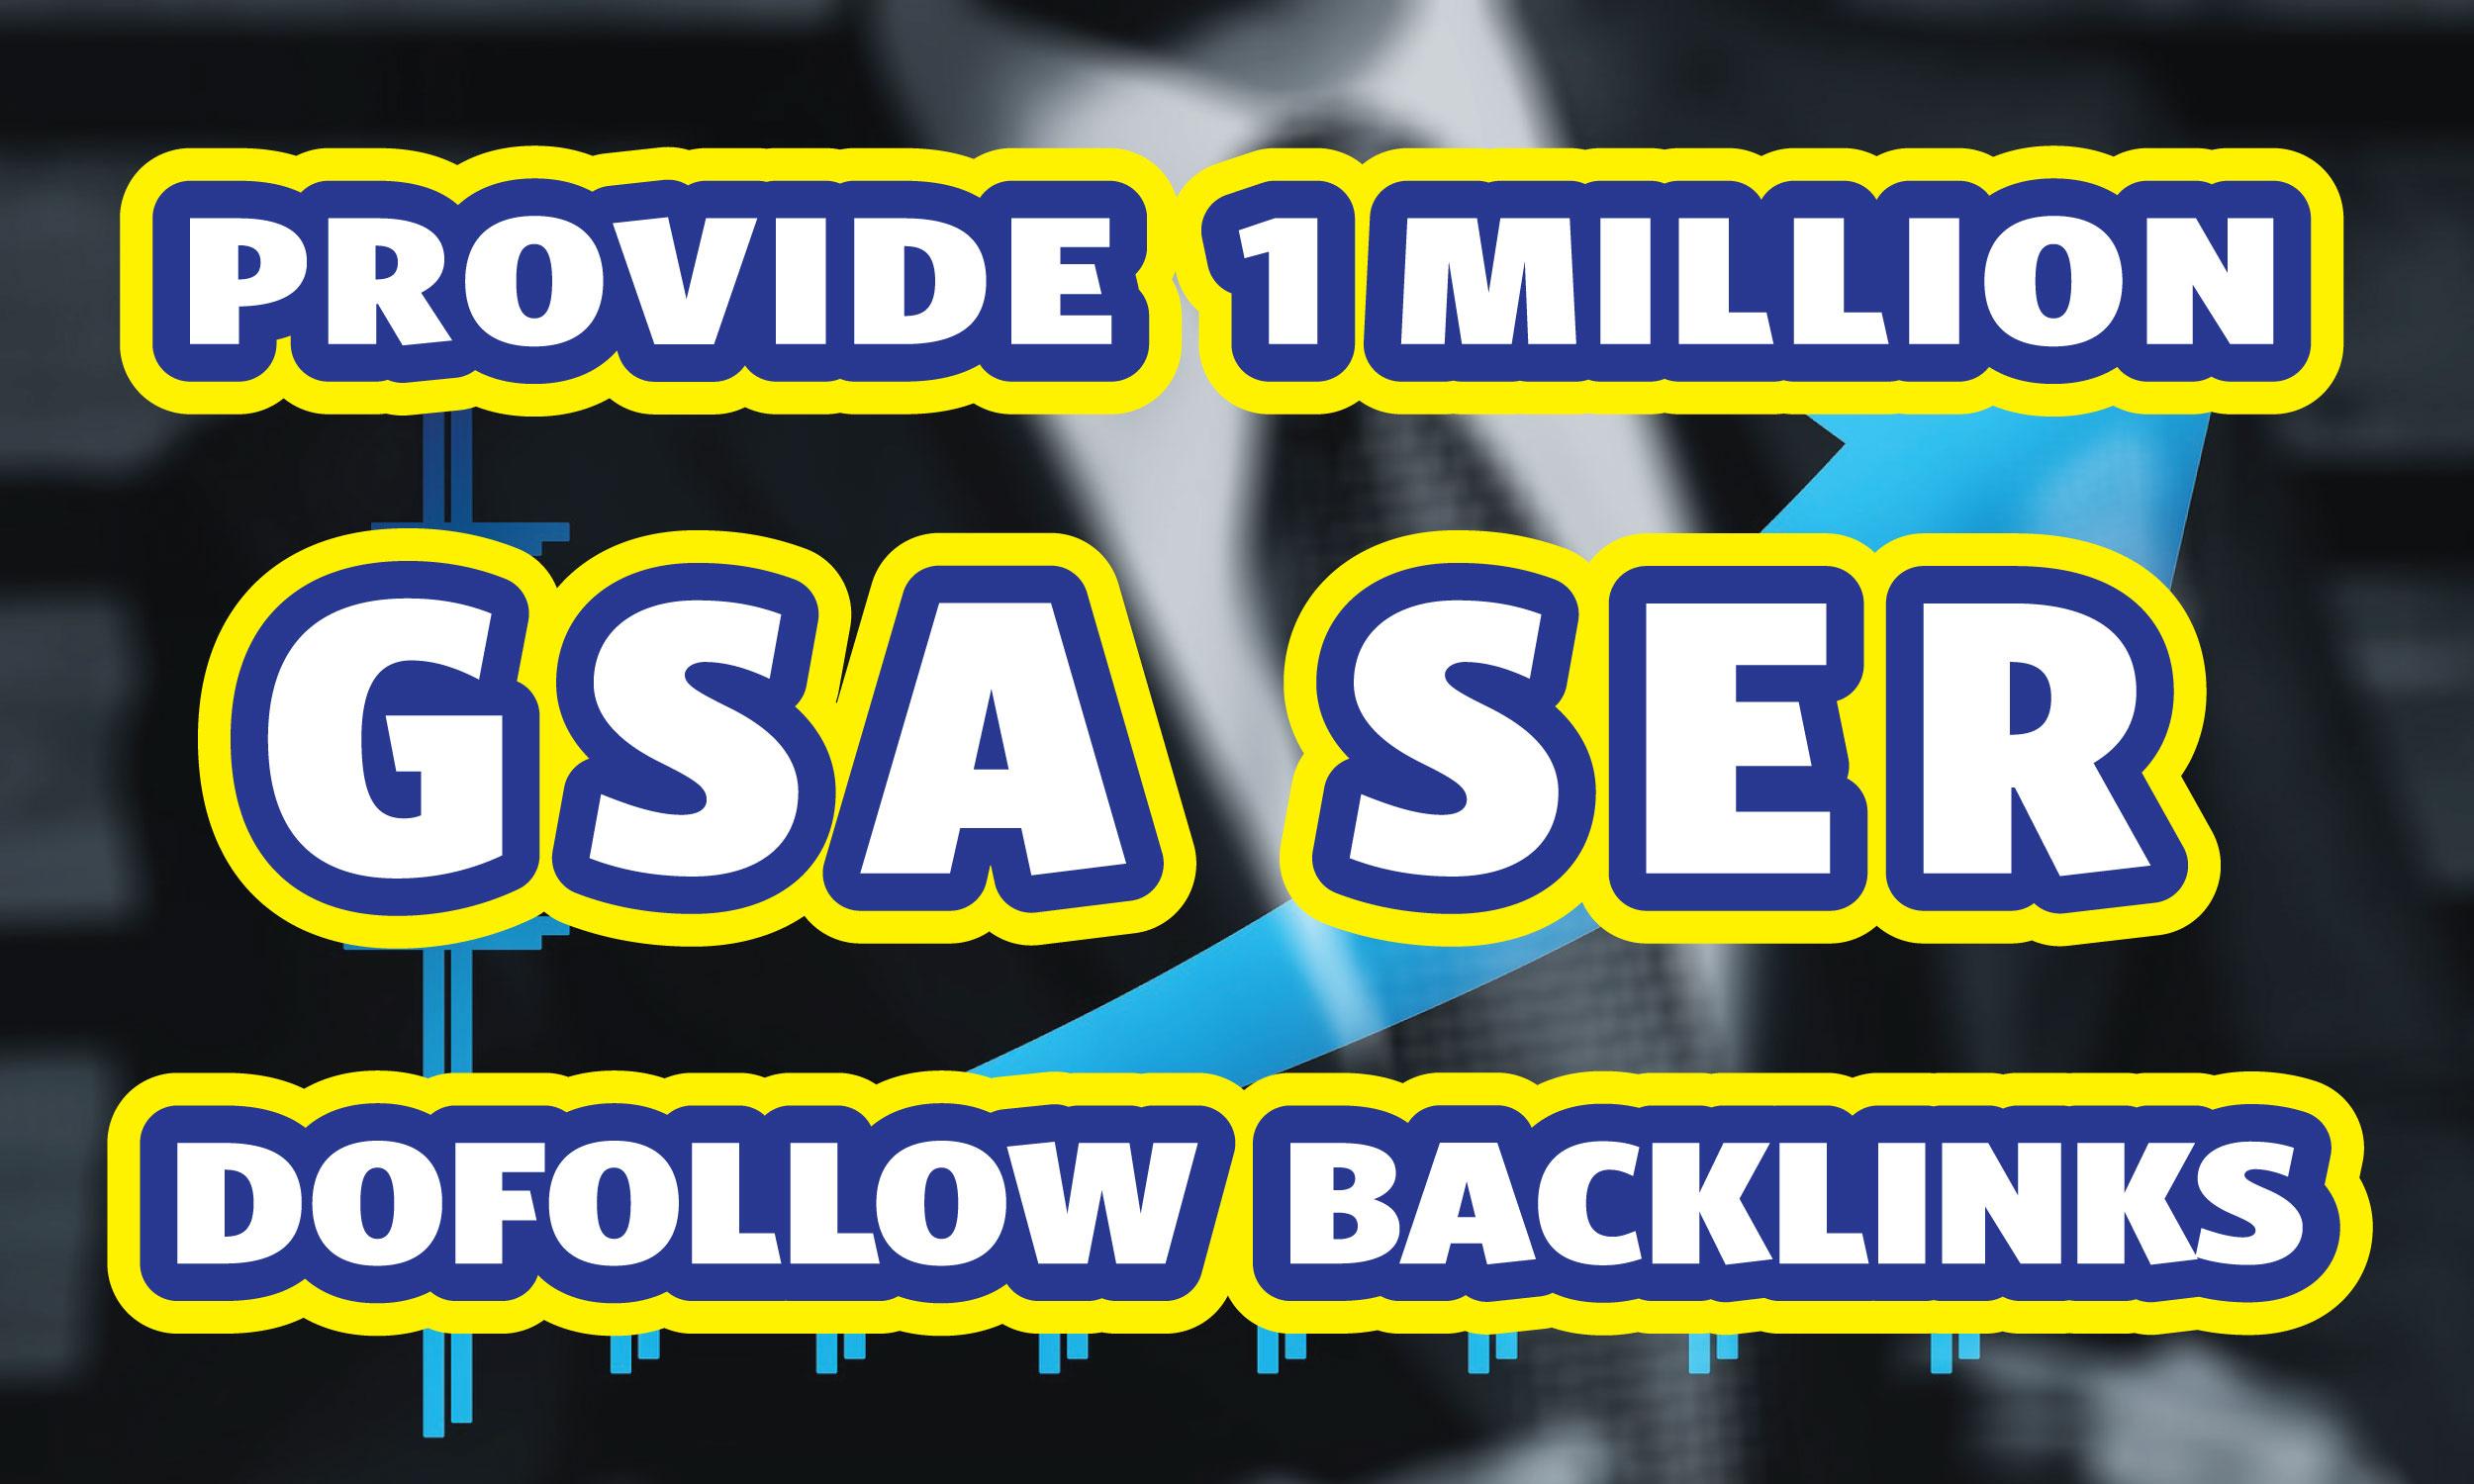 Create 1 million GSA SER Unique Dofollow Backlinks for Fastest Google Ranking